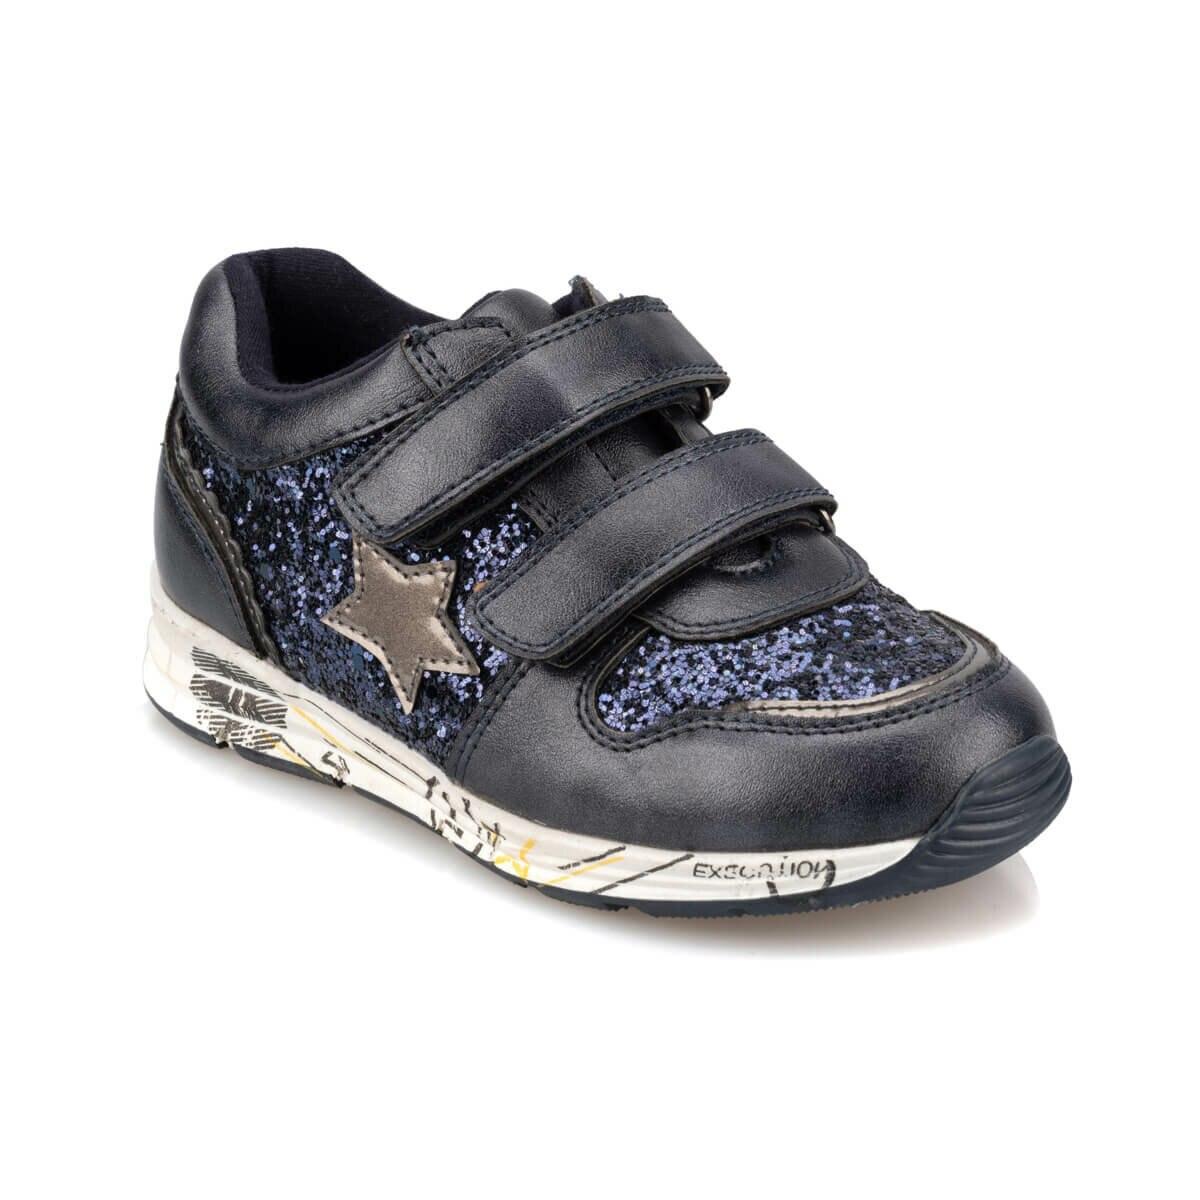 FLO 92.511779.P Navy Blue Female Child Sports Shoes Polaris